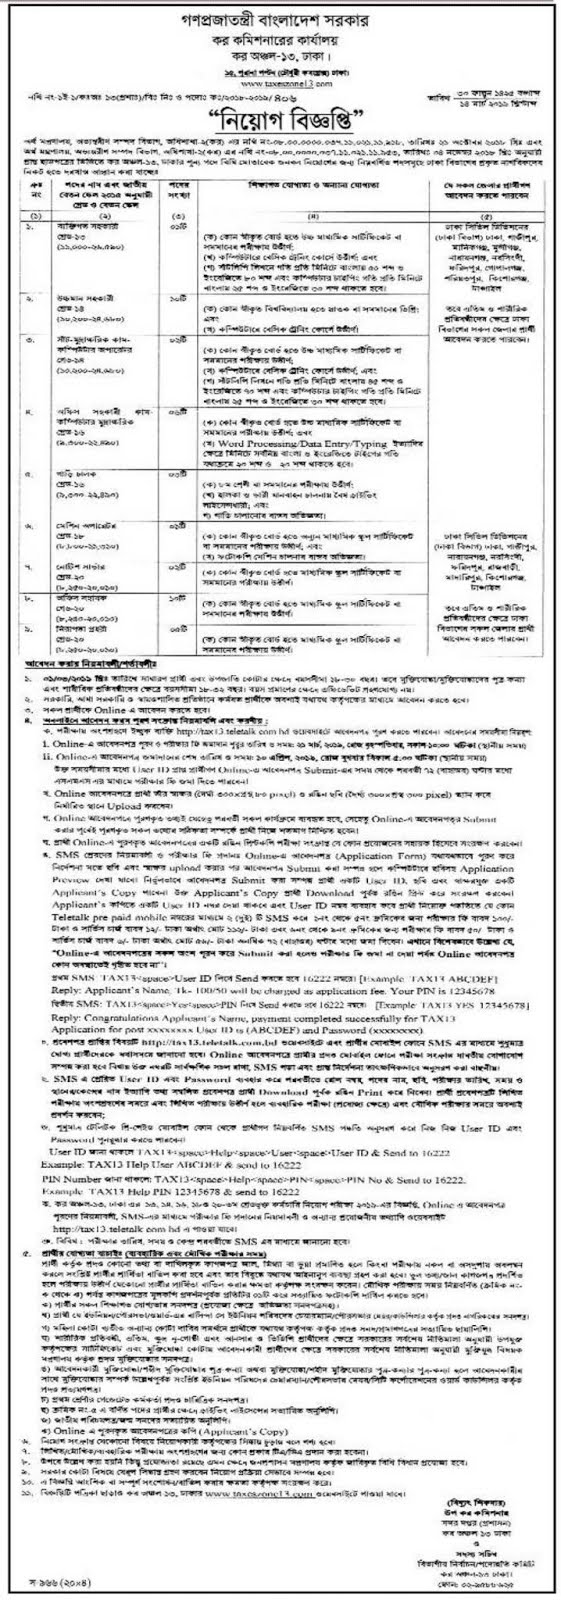 Job Circular 2019-Tax Commissioner Office Image